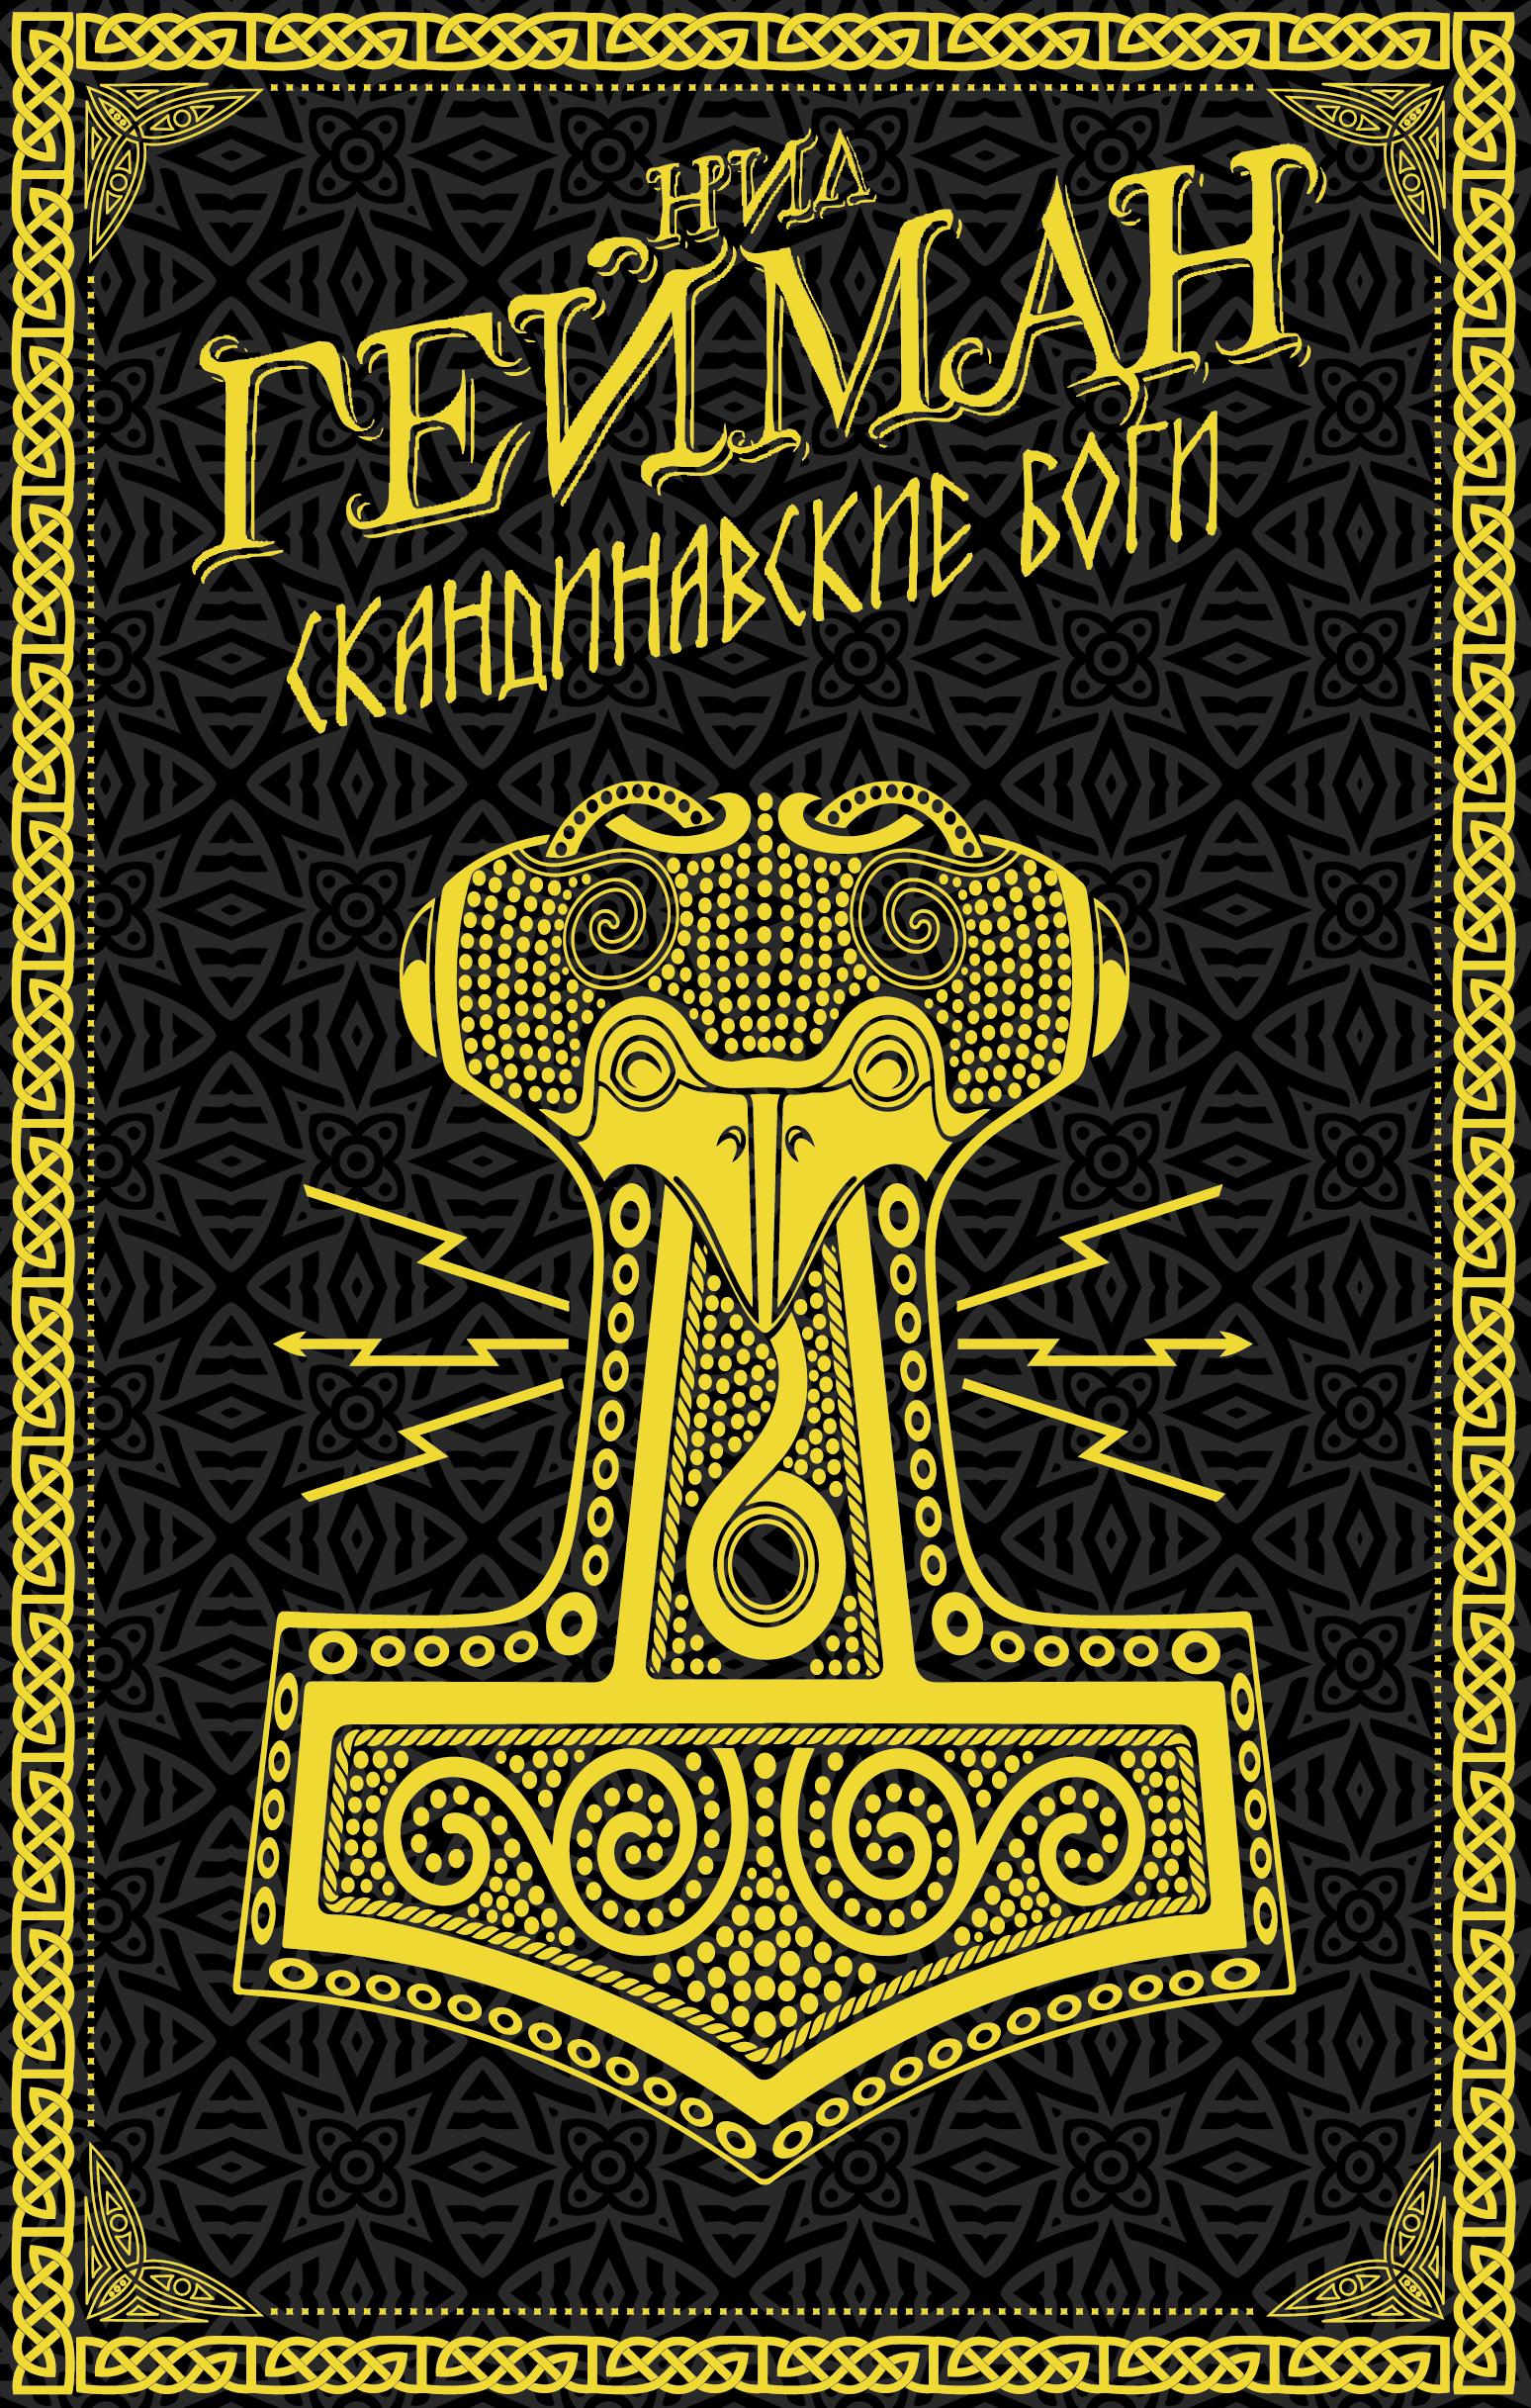 Скандинавские боги ( Гейман Нил  )